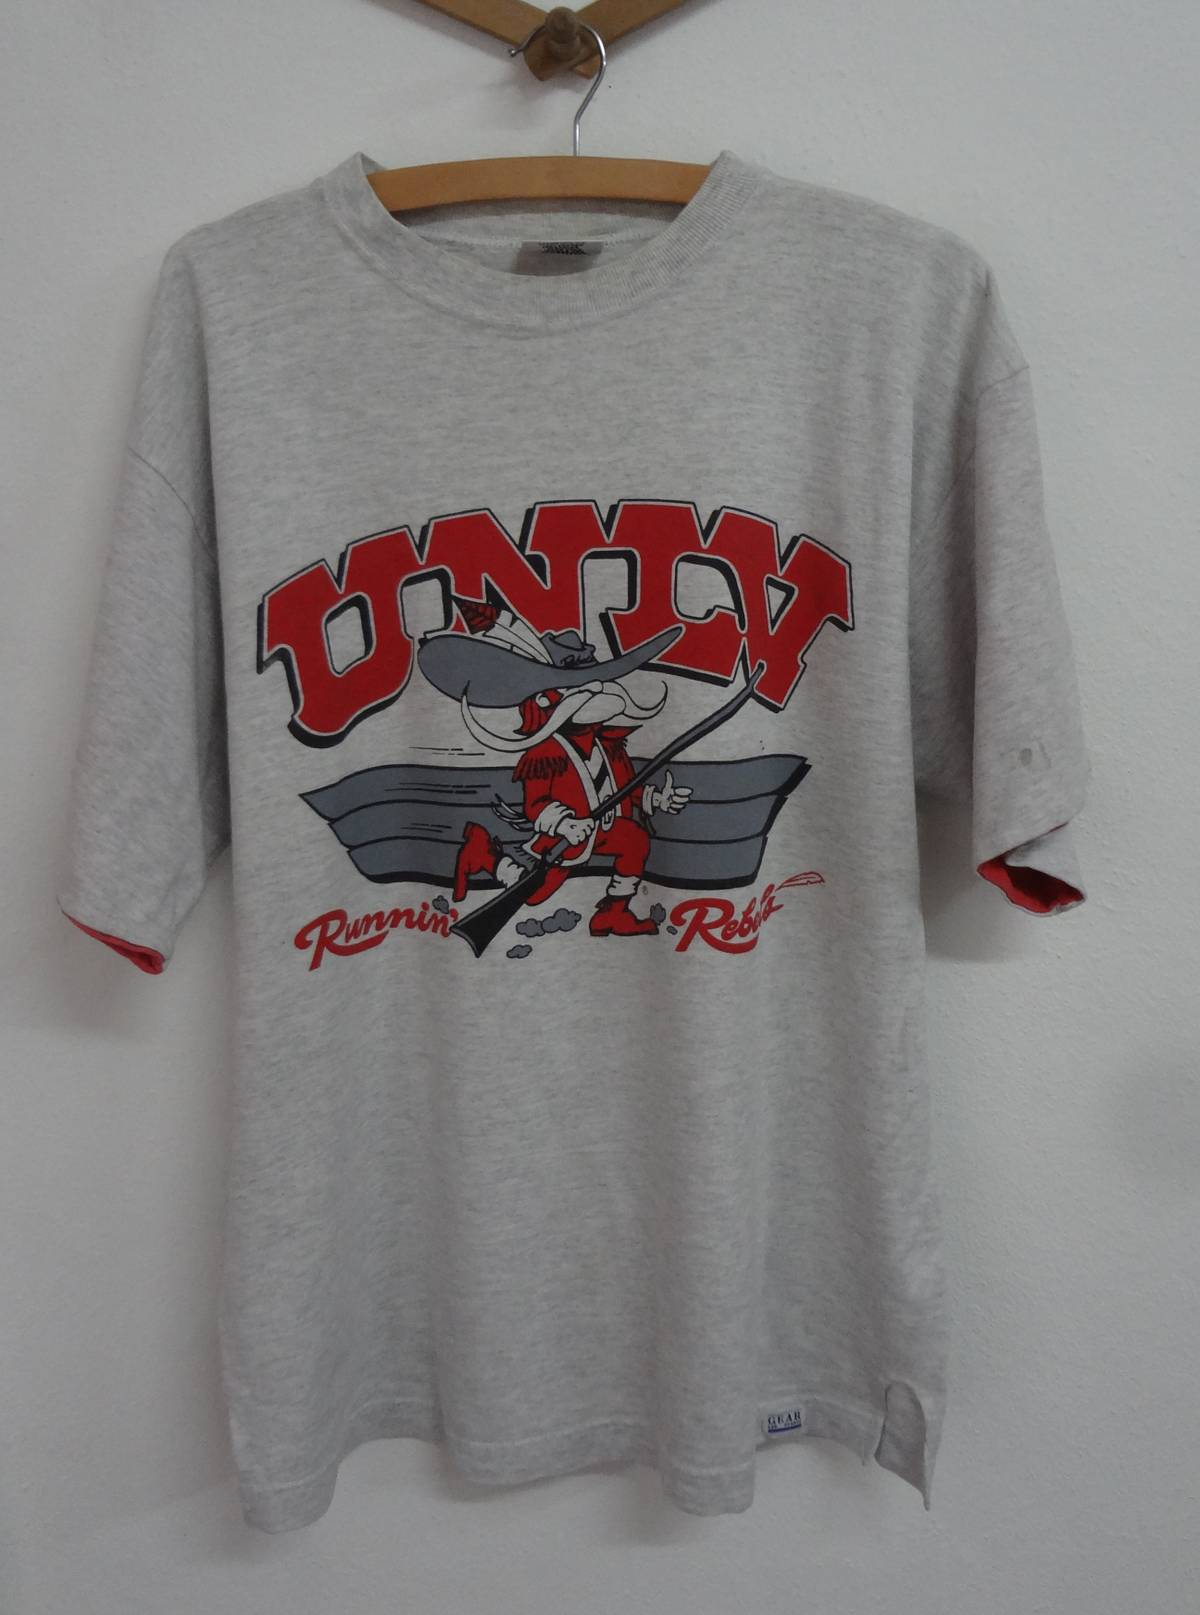 Ouray Sportswear NCAA UNLV Rebels Youth Vintage Sheer TeeYouth Vintage Sheer Tee